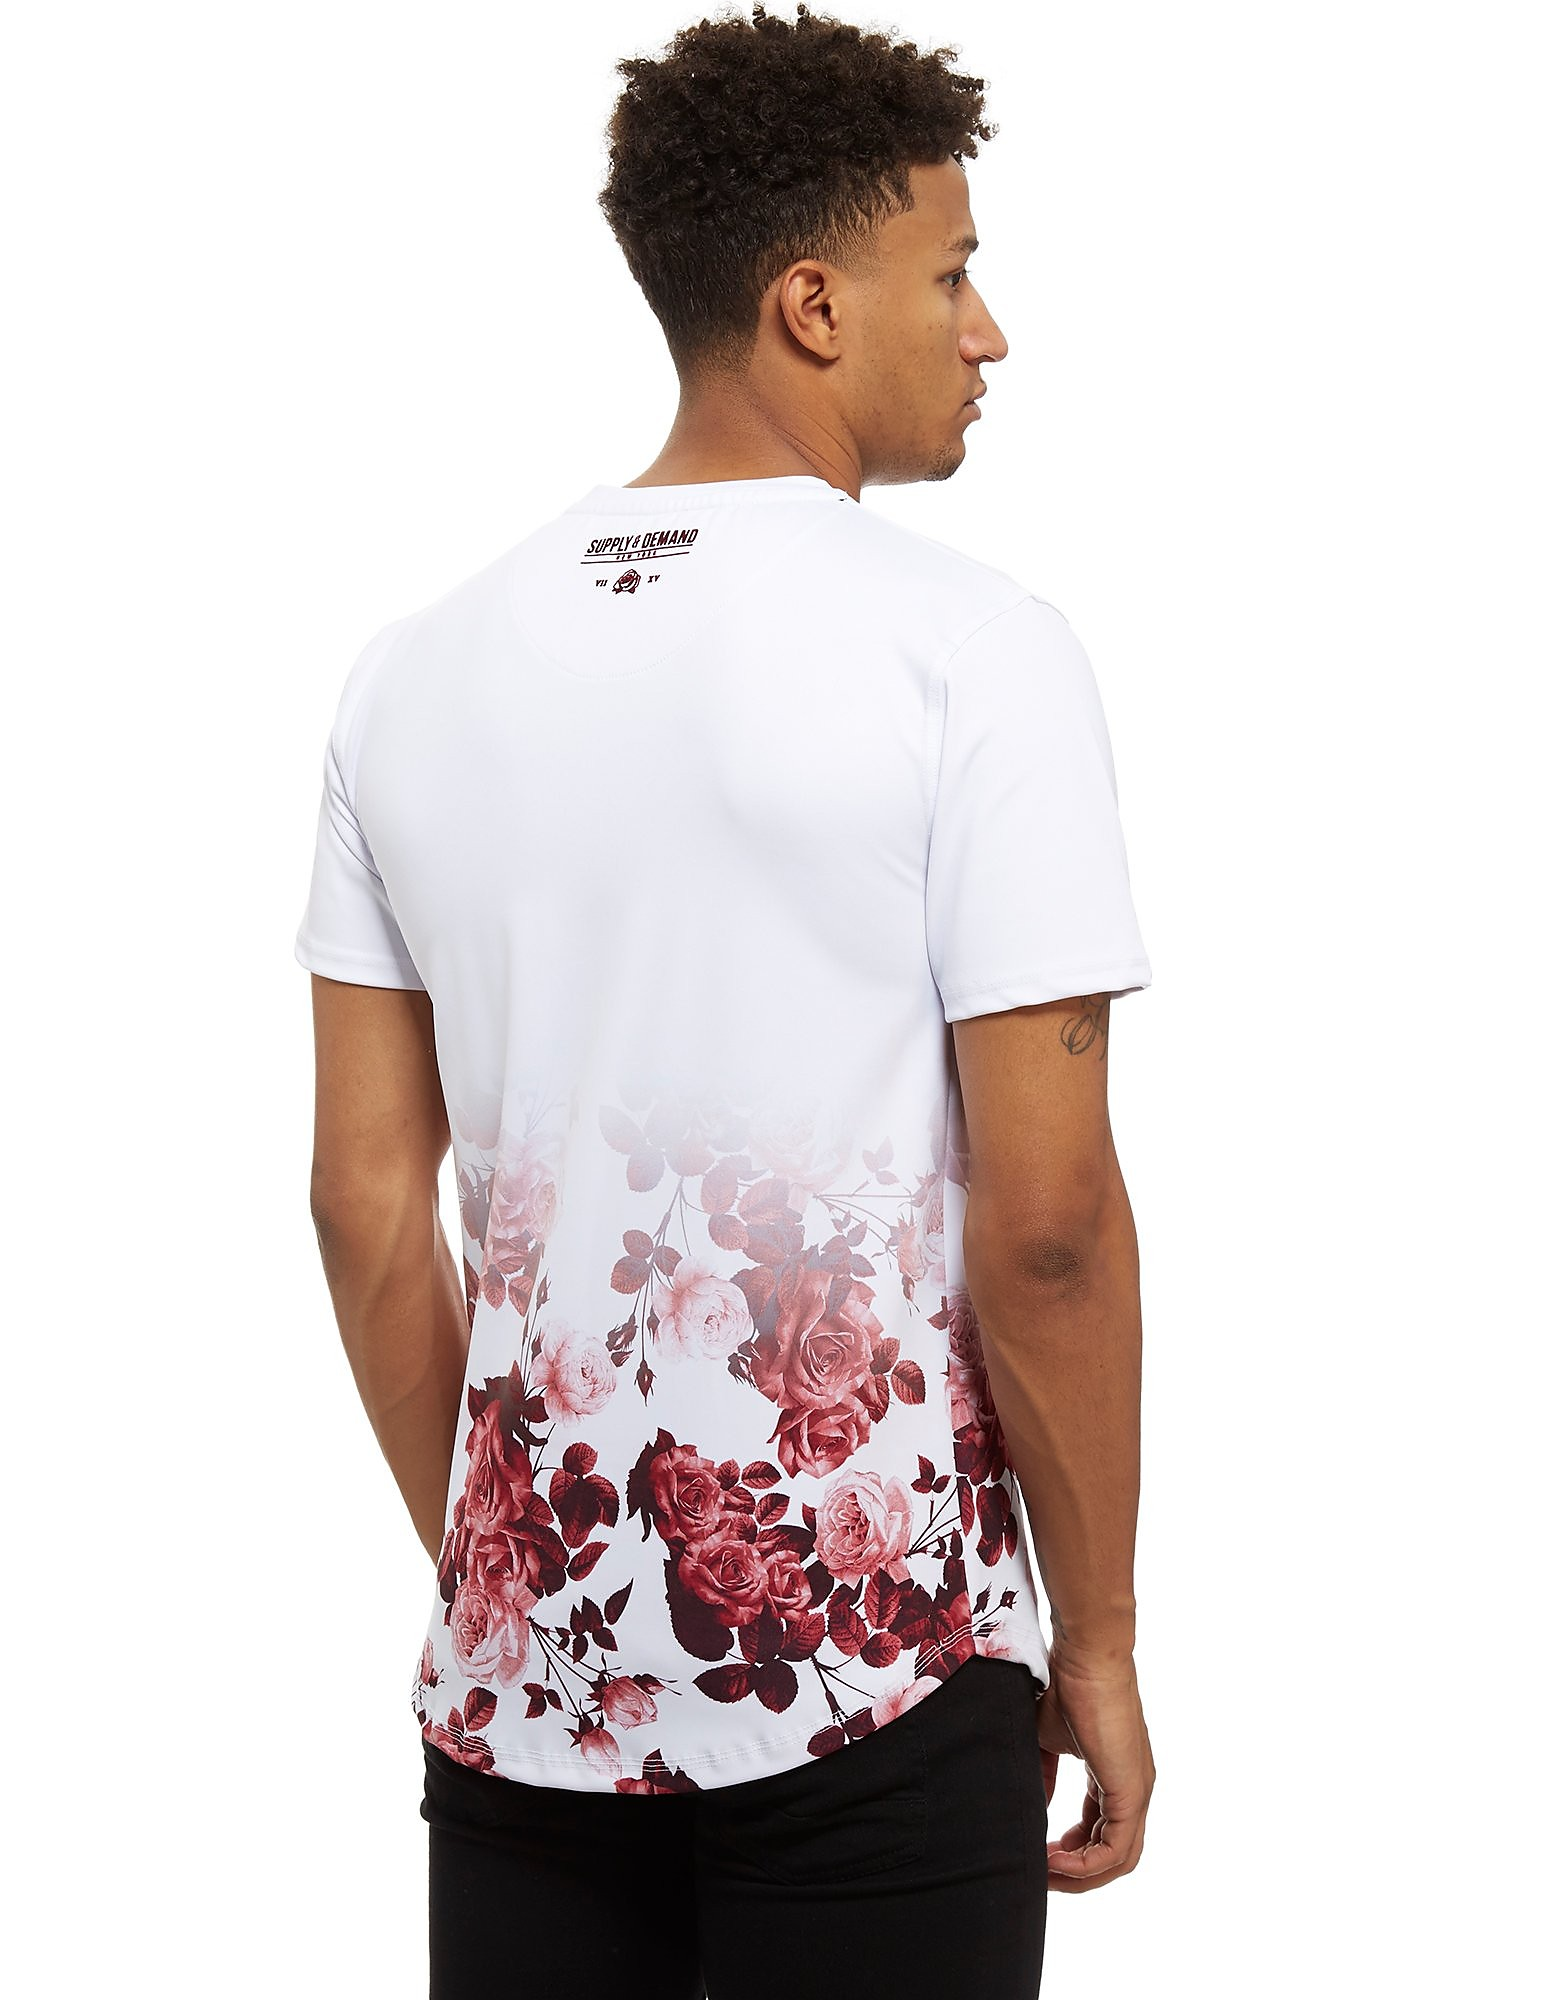 Supply & Demand Snow Gothic T-Shirt